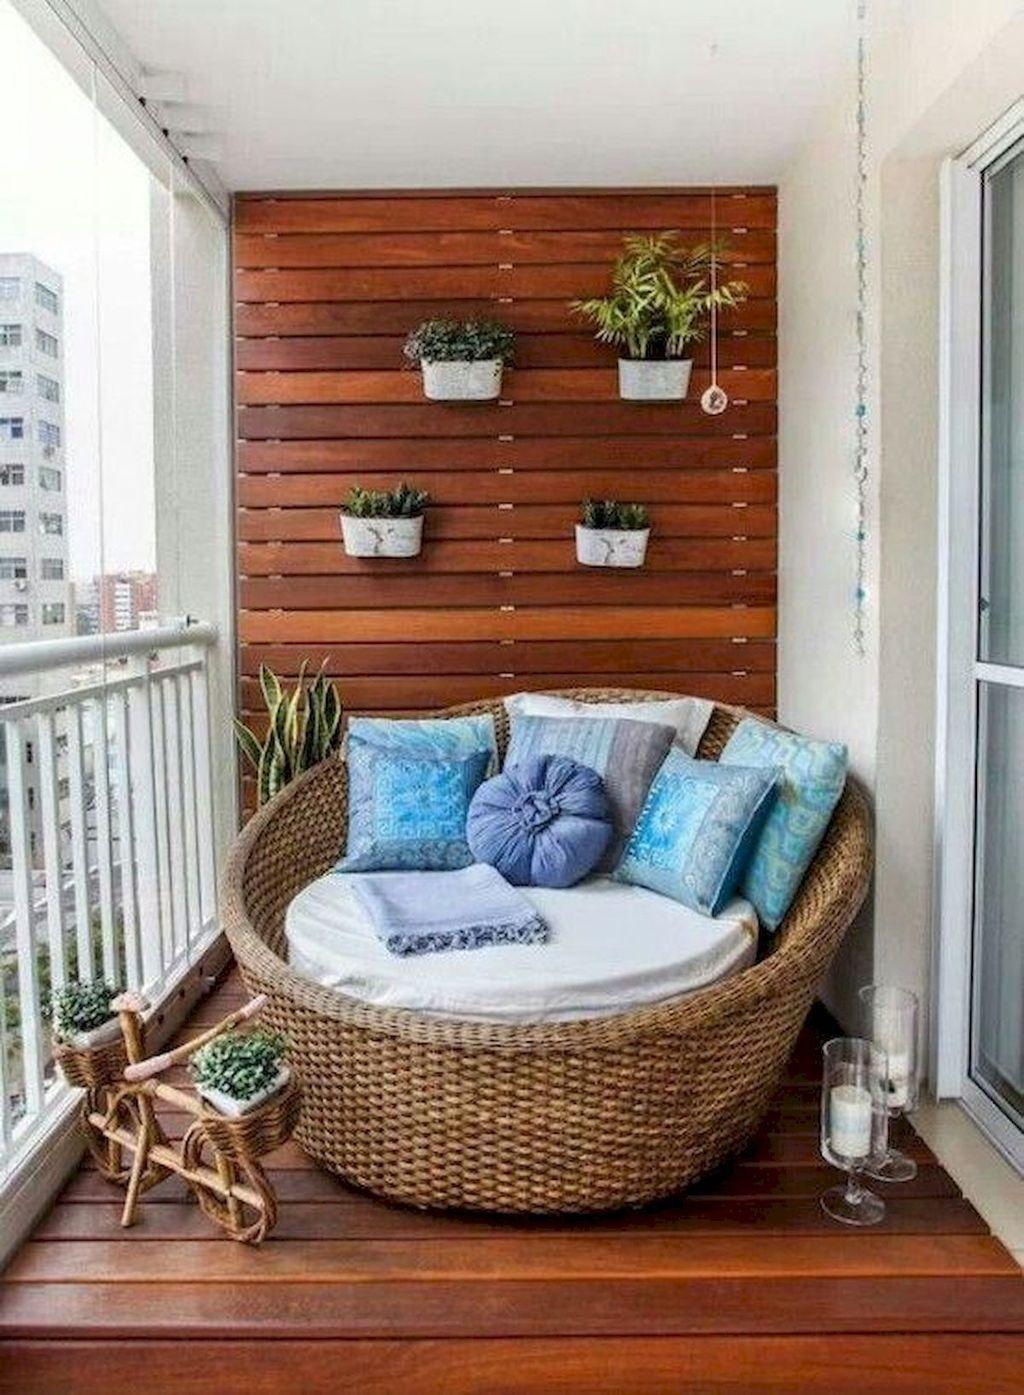 идеи интерьера вашей квартиры фото 4